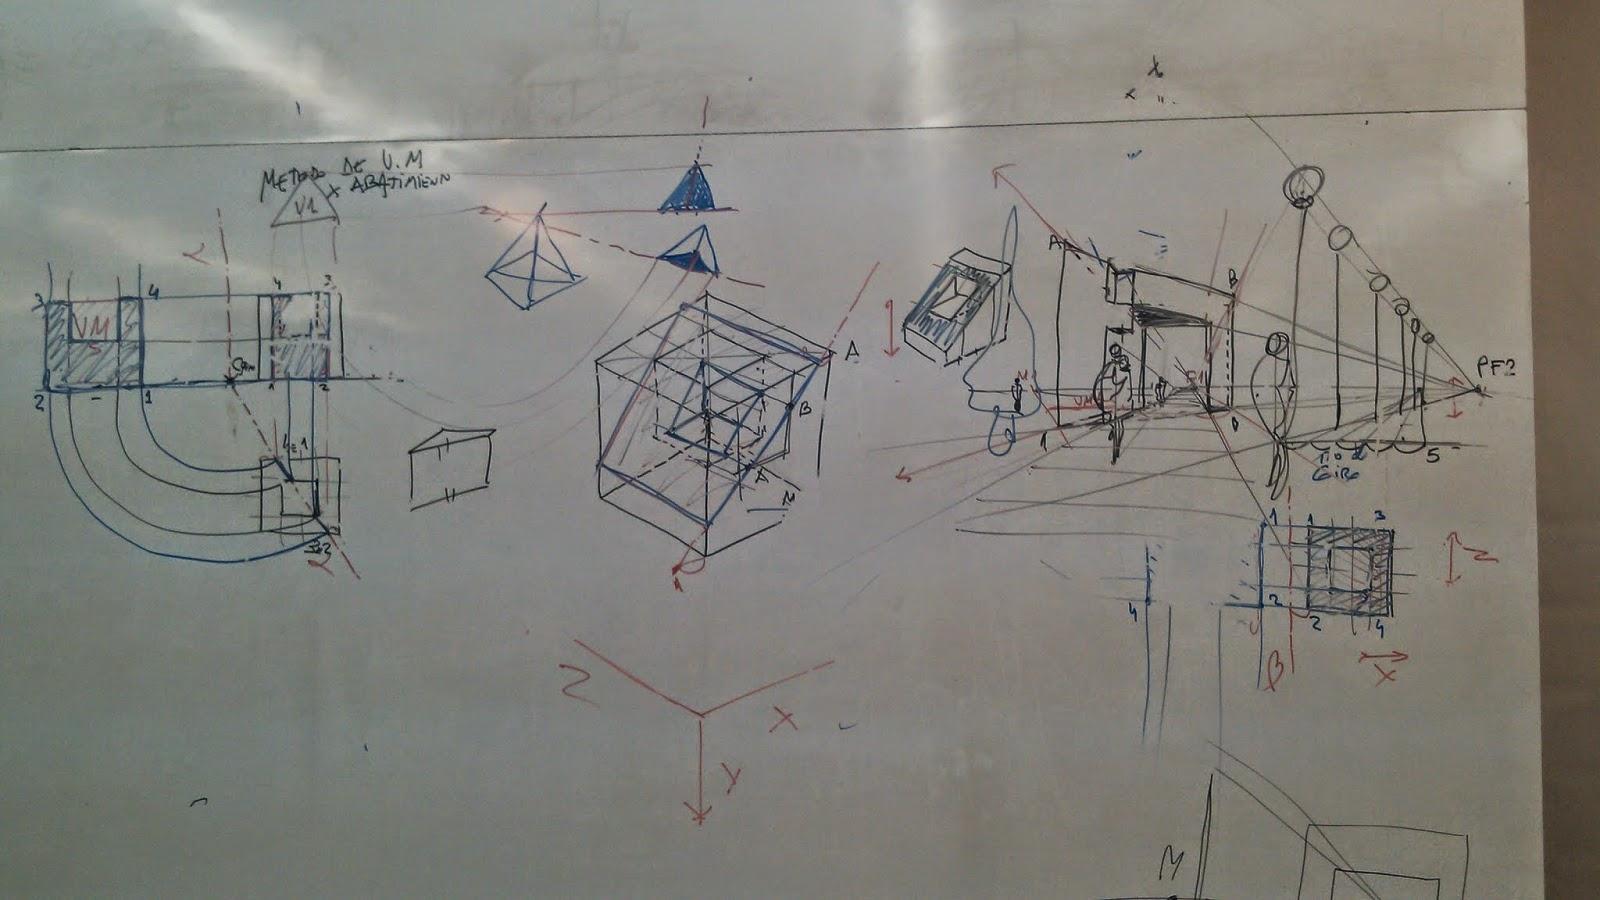 La Verdadera Magnitud: Arquitectura: Clase 30 De Abril